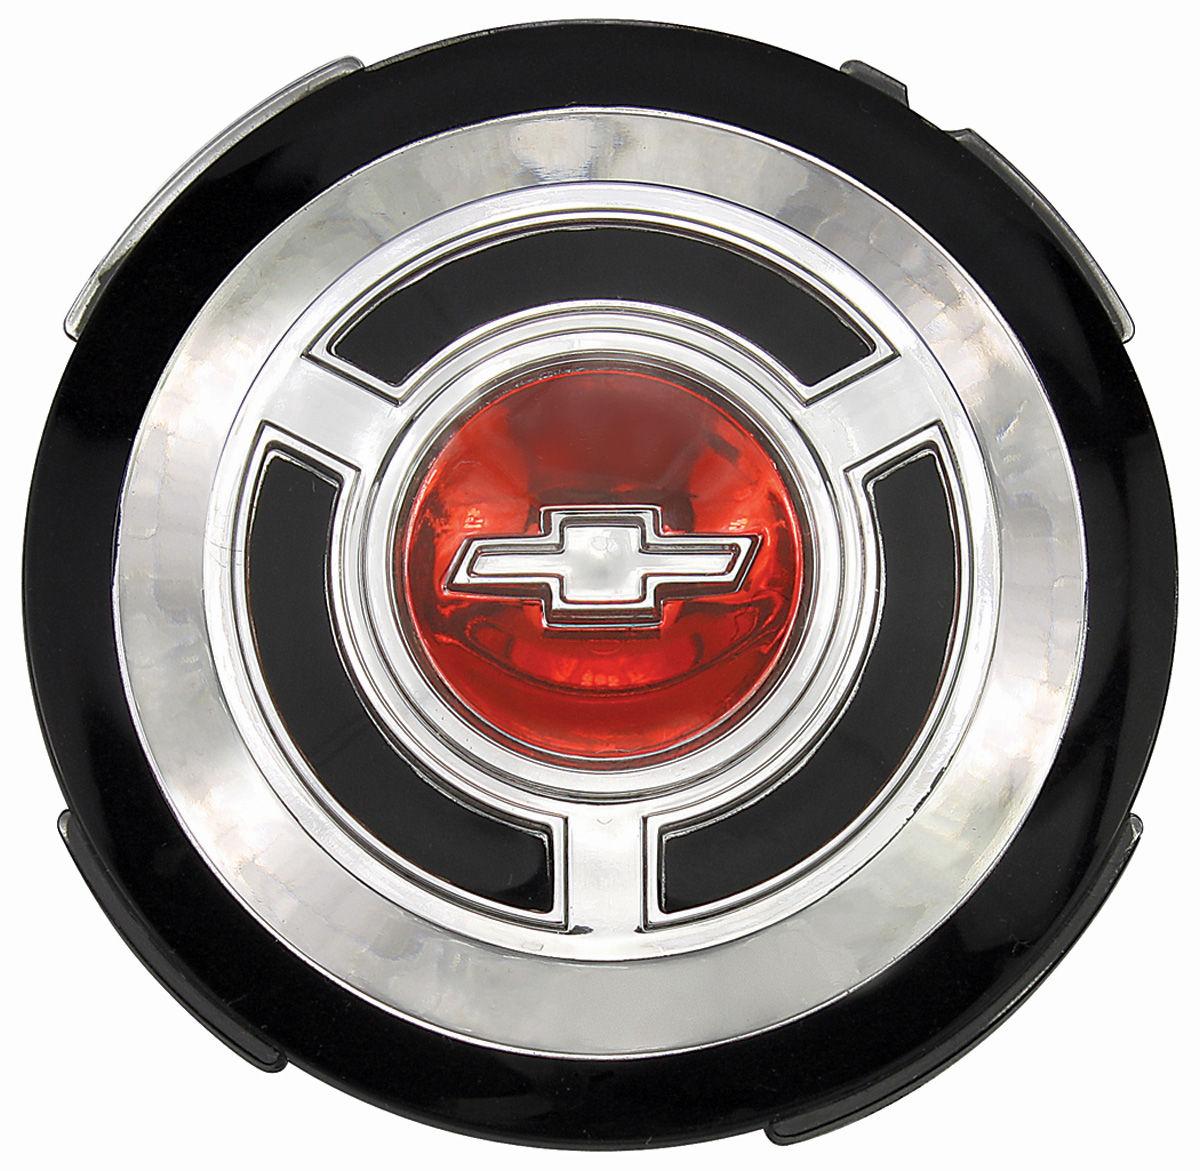 Emblem, Wheel Cover, 1965 Chevelle/El Camino, Standard